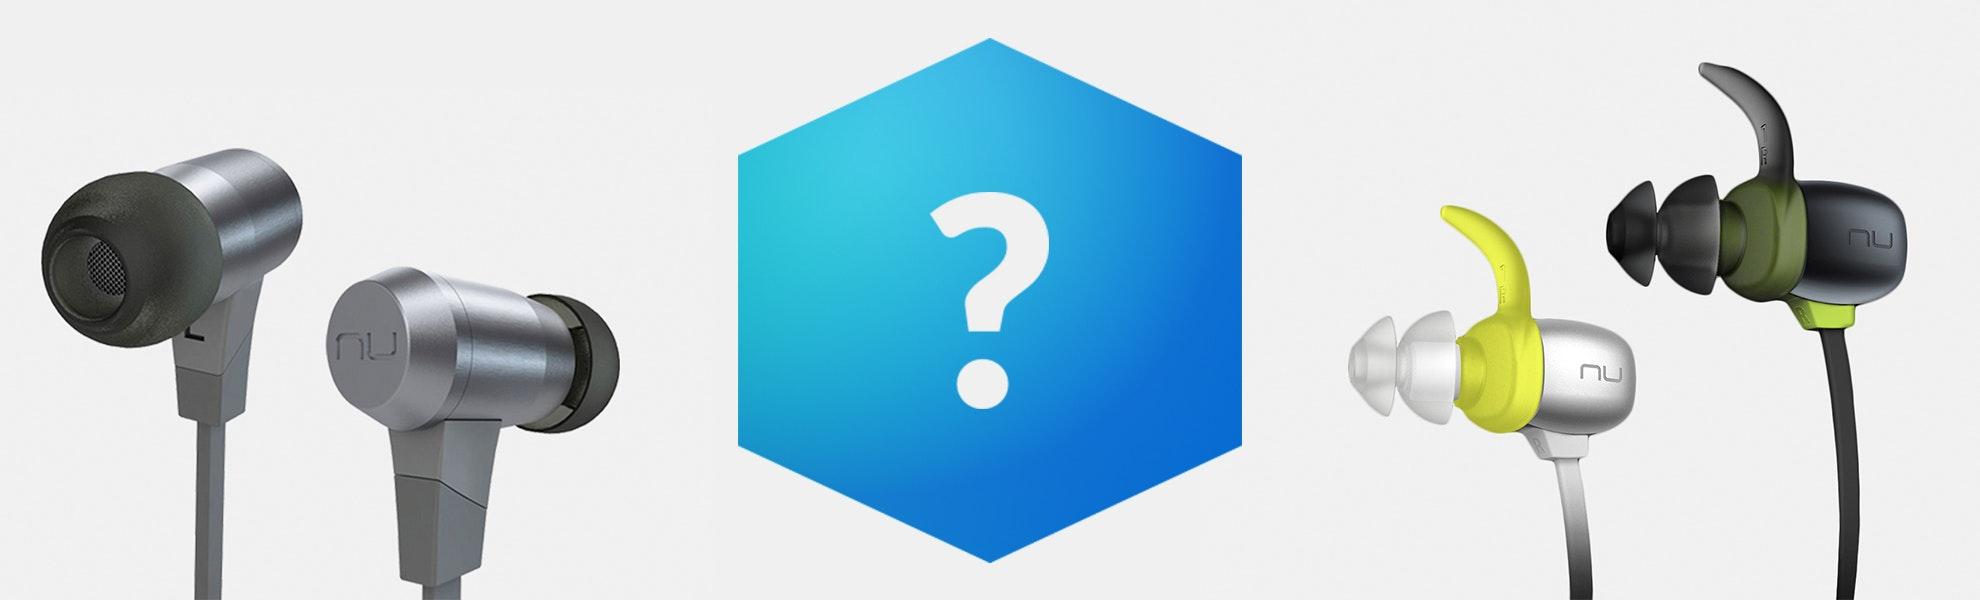 Massdrop Blue Box: NuForce Wireless IEMs